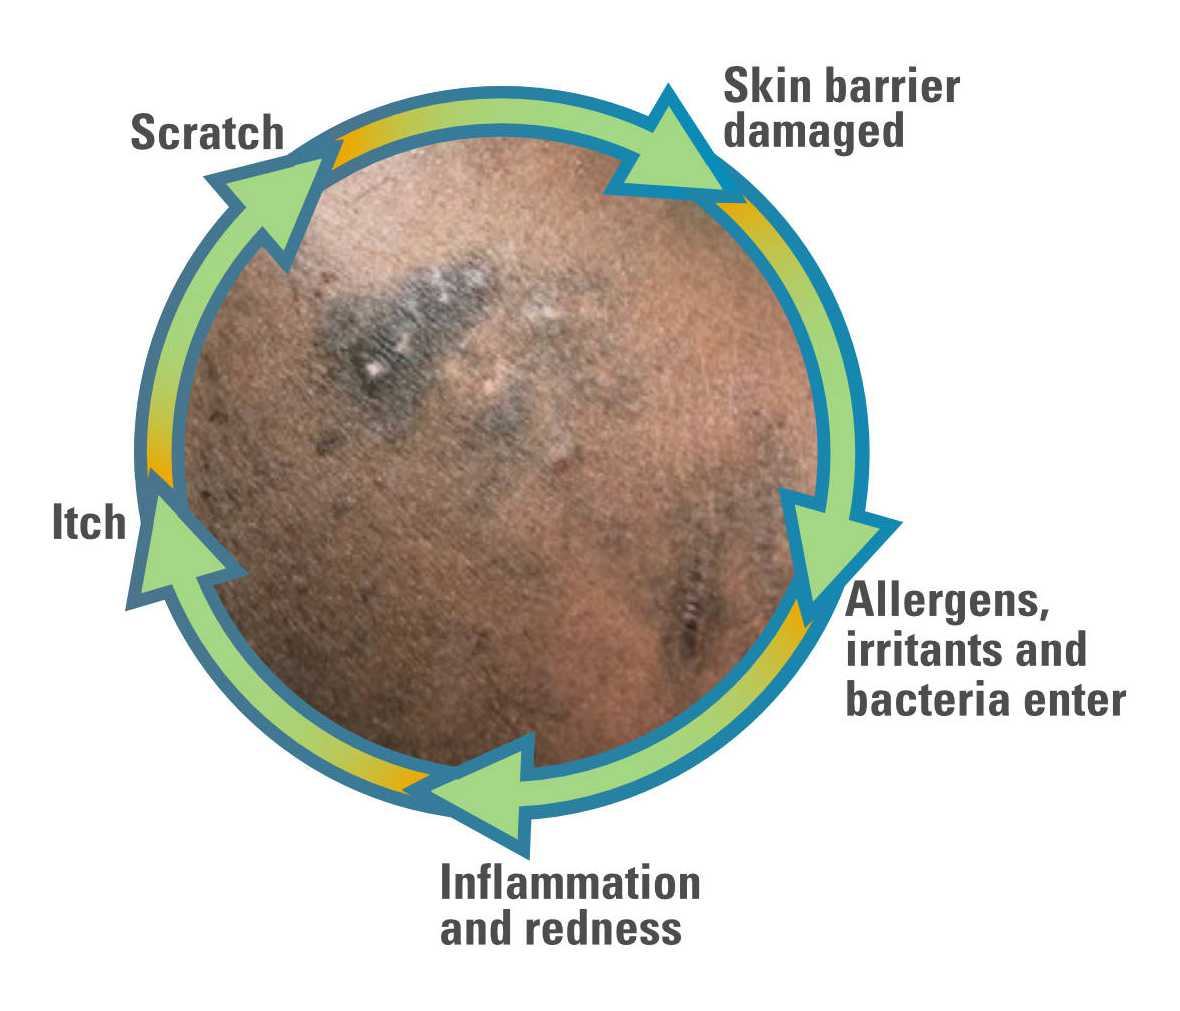 Itch scratch cycle of eczema